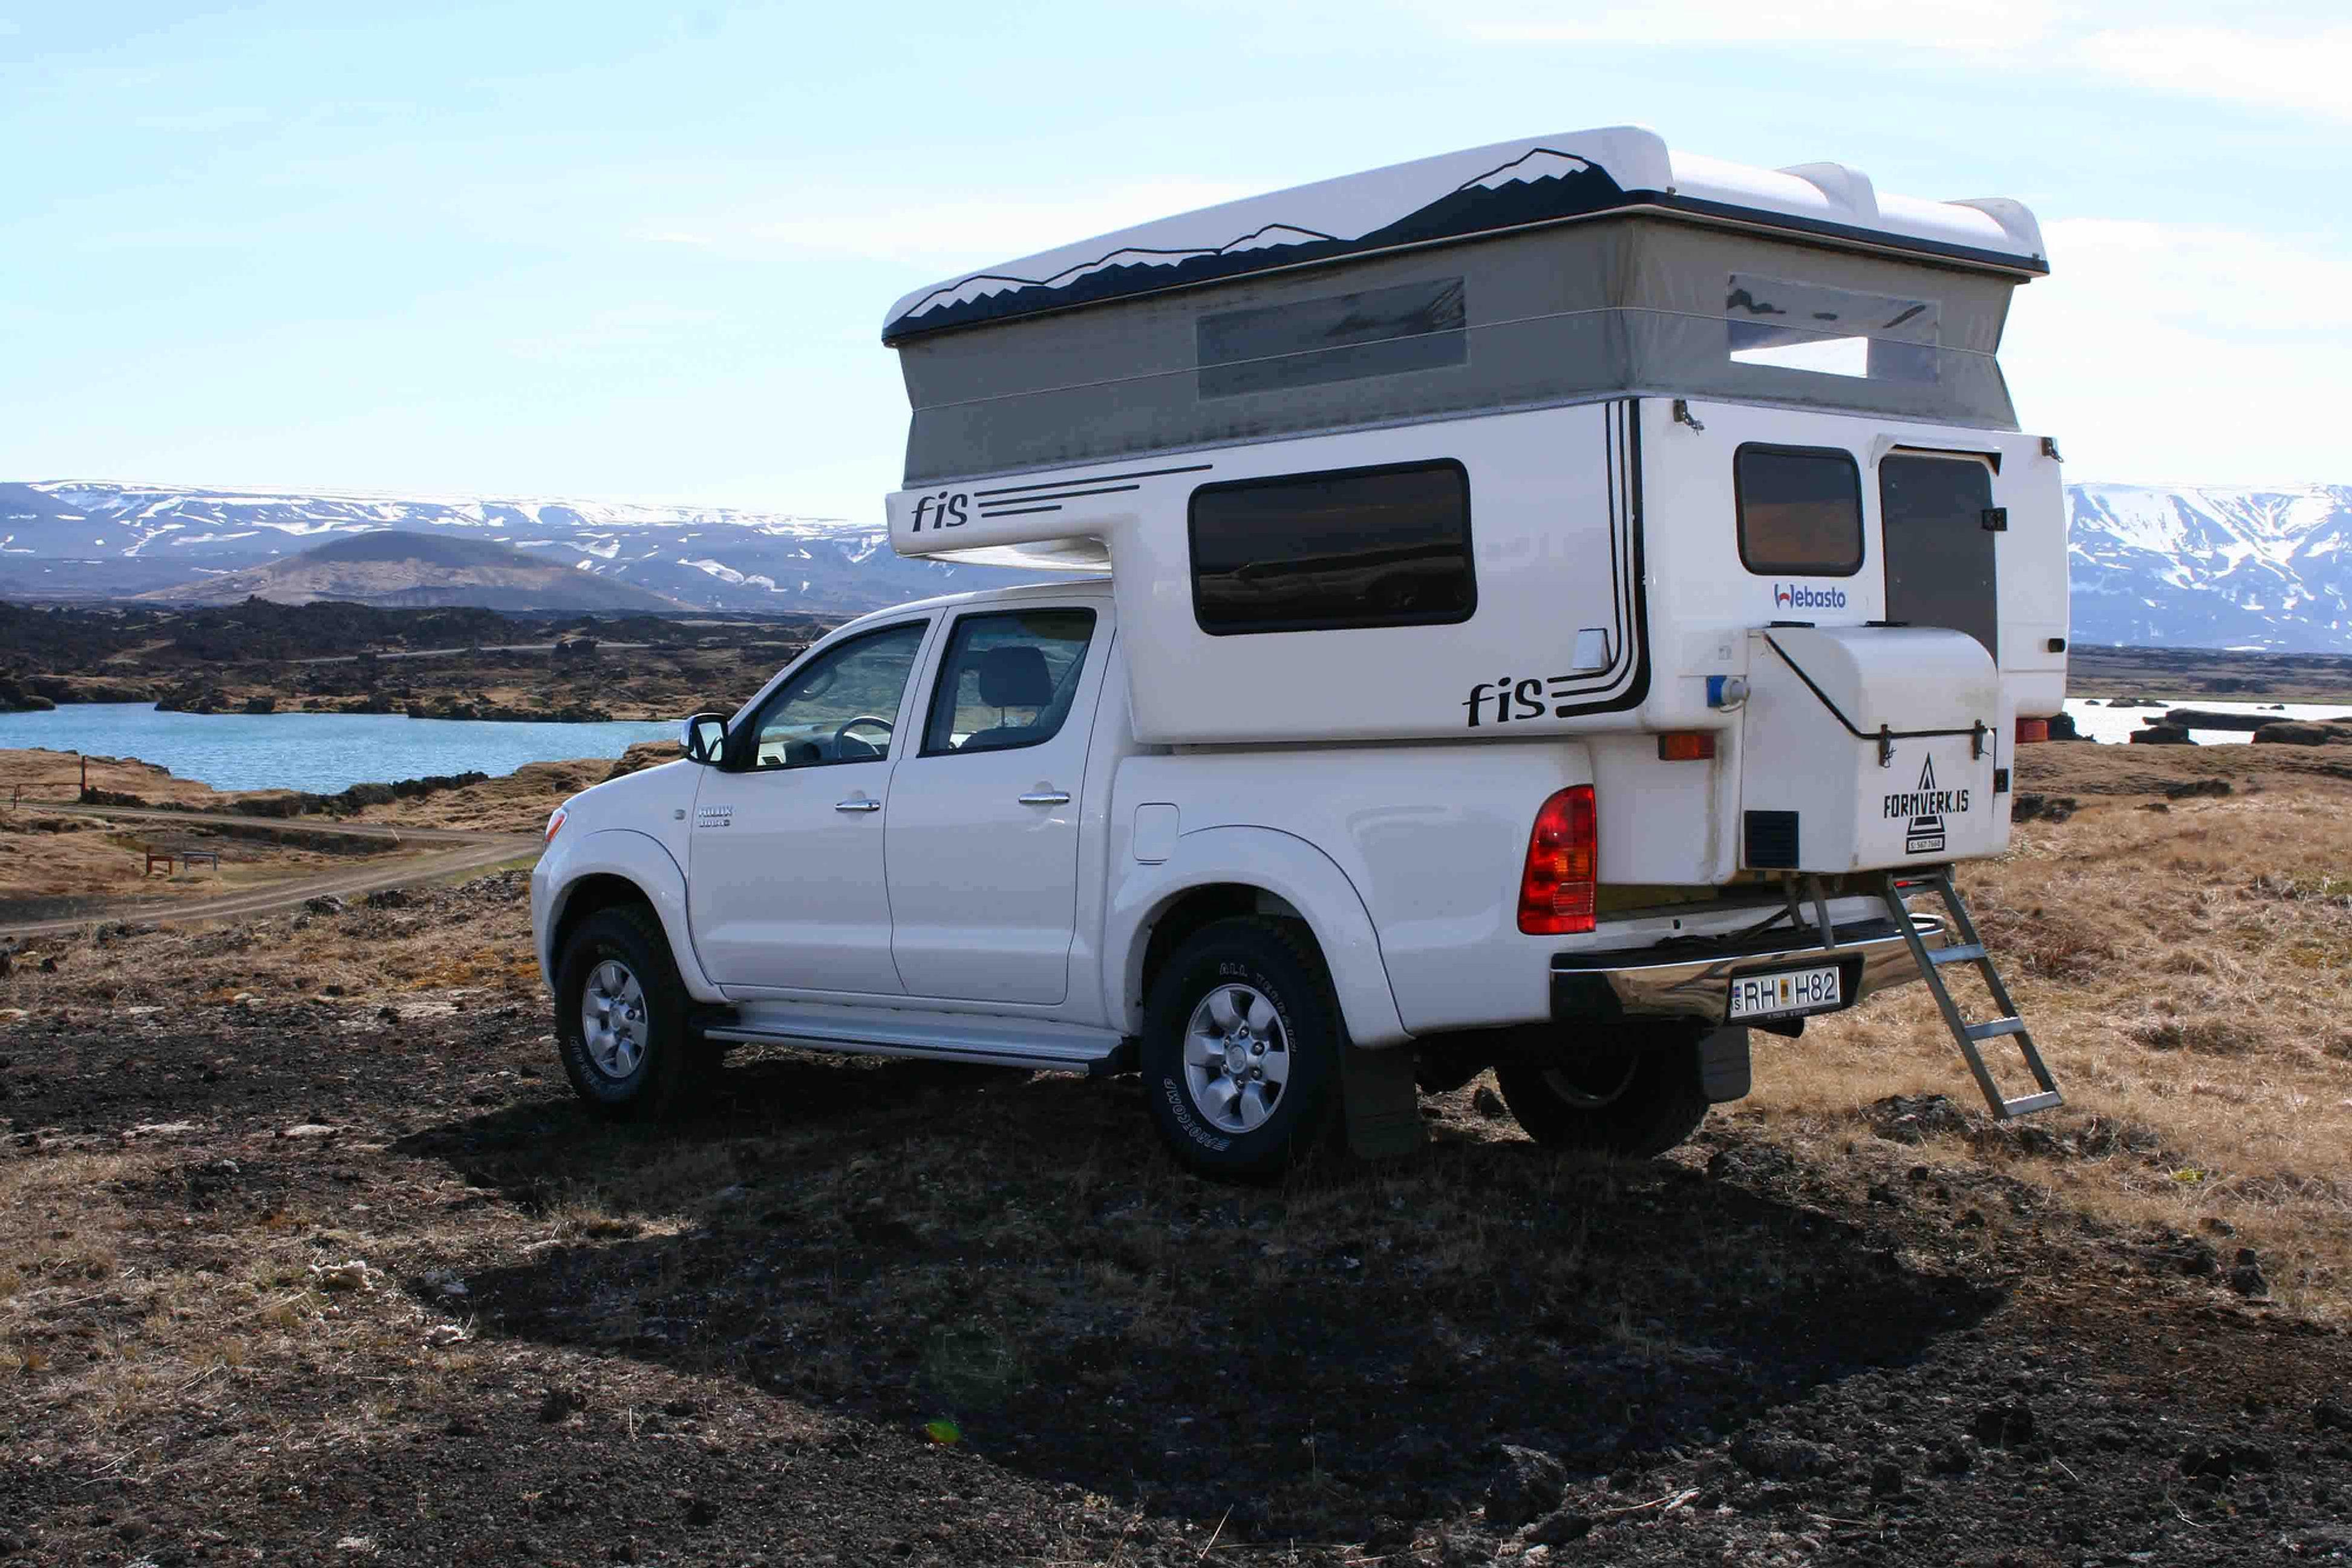 camping islande iceland camping car islande camping islande. Black Bedroom Furniture Sets. Home Design Ideas